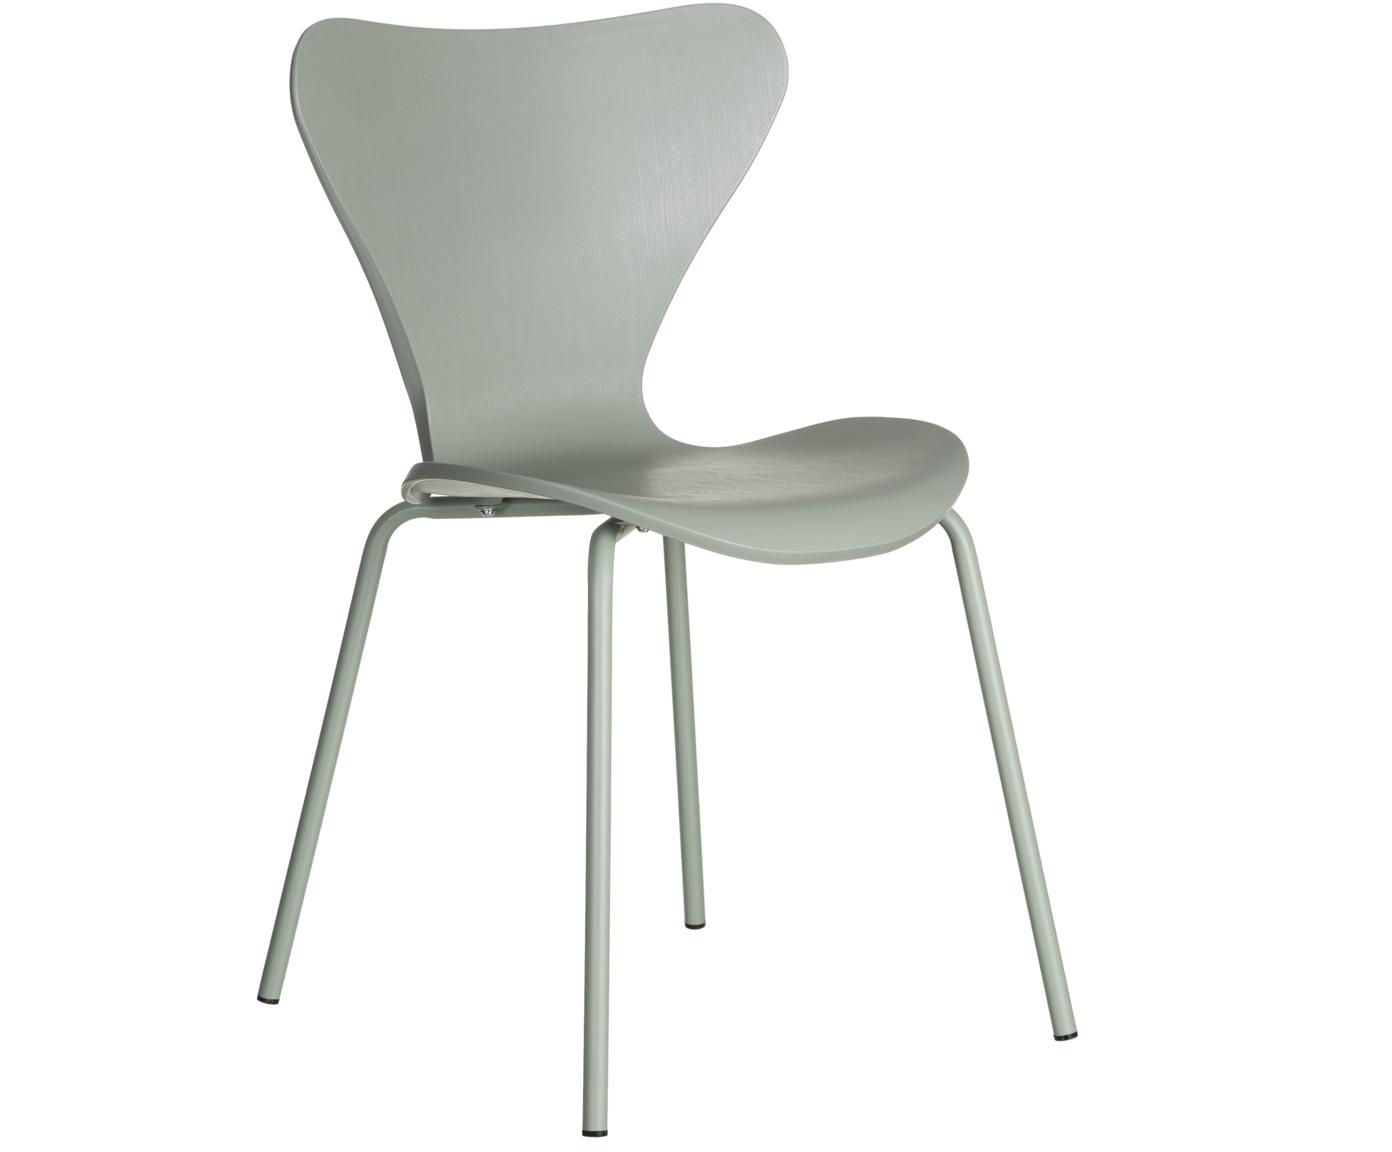 Stapelbare Kunststoffstühle Pippi, 2 Stück, Sitzfläche: Polypropylen, Beine: Metall, beschichtet, Minze, B 47 x T 50 cm